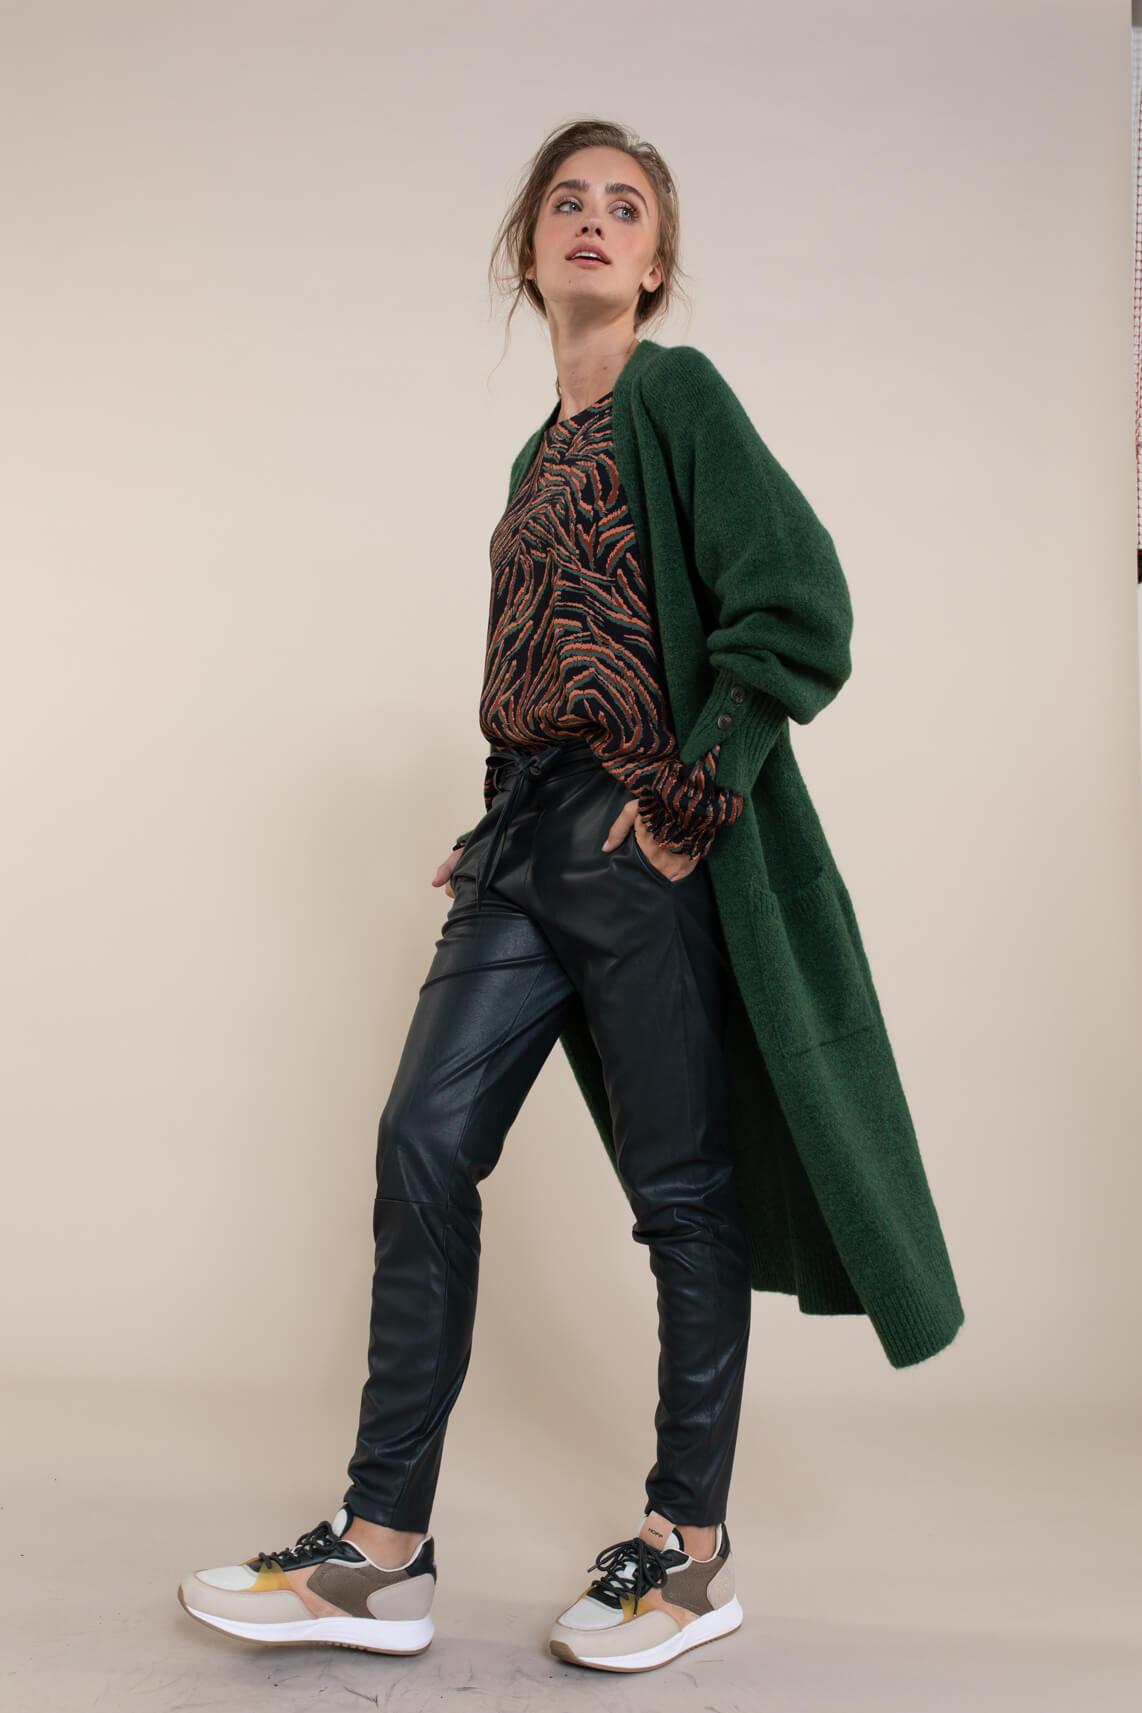 Anna Dames Fake leather broek groen